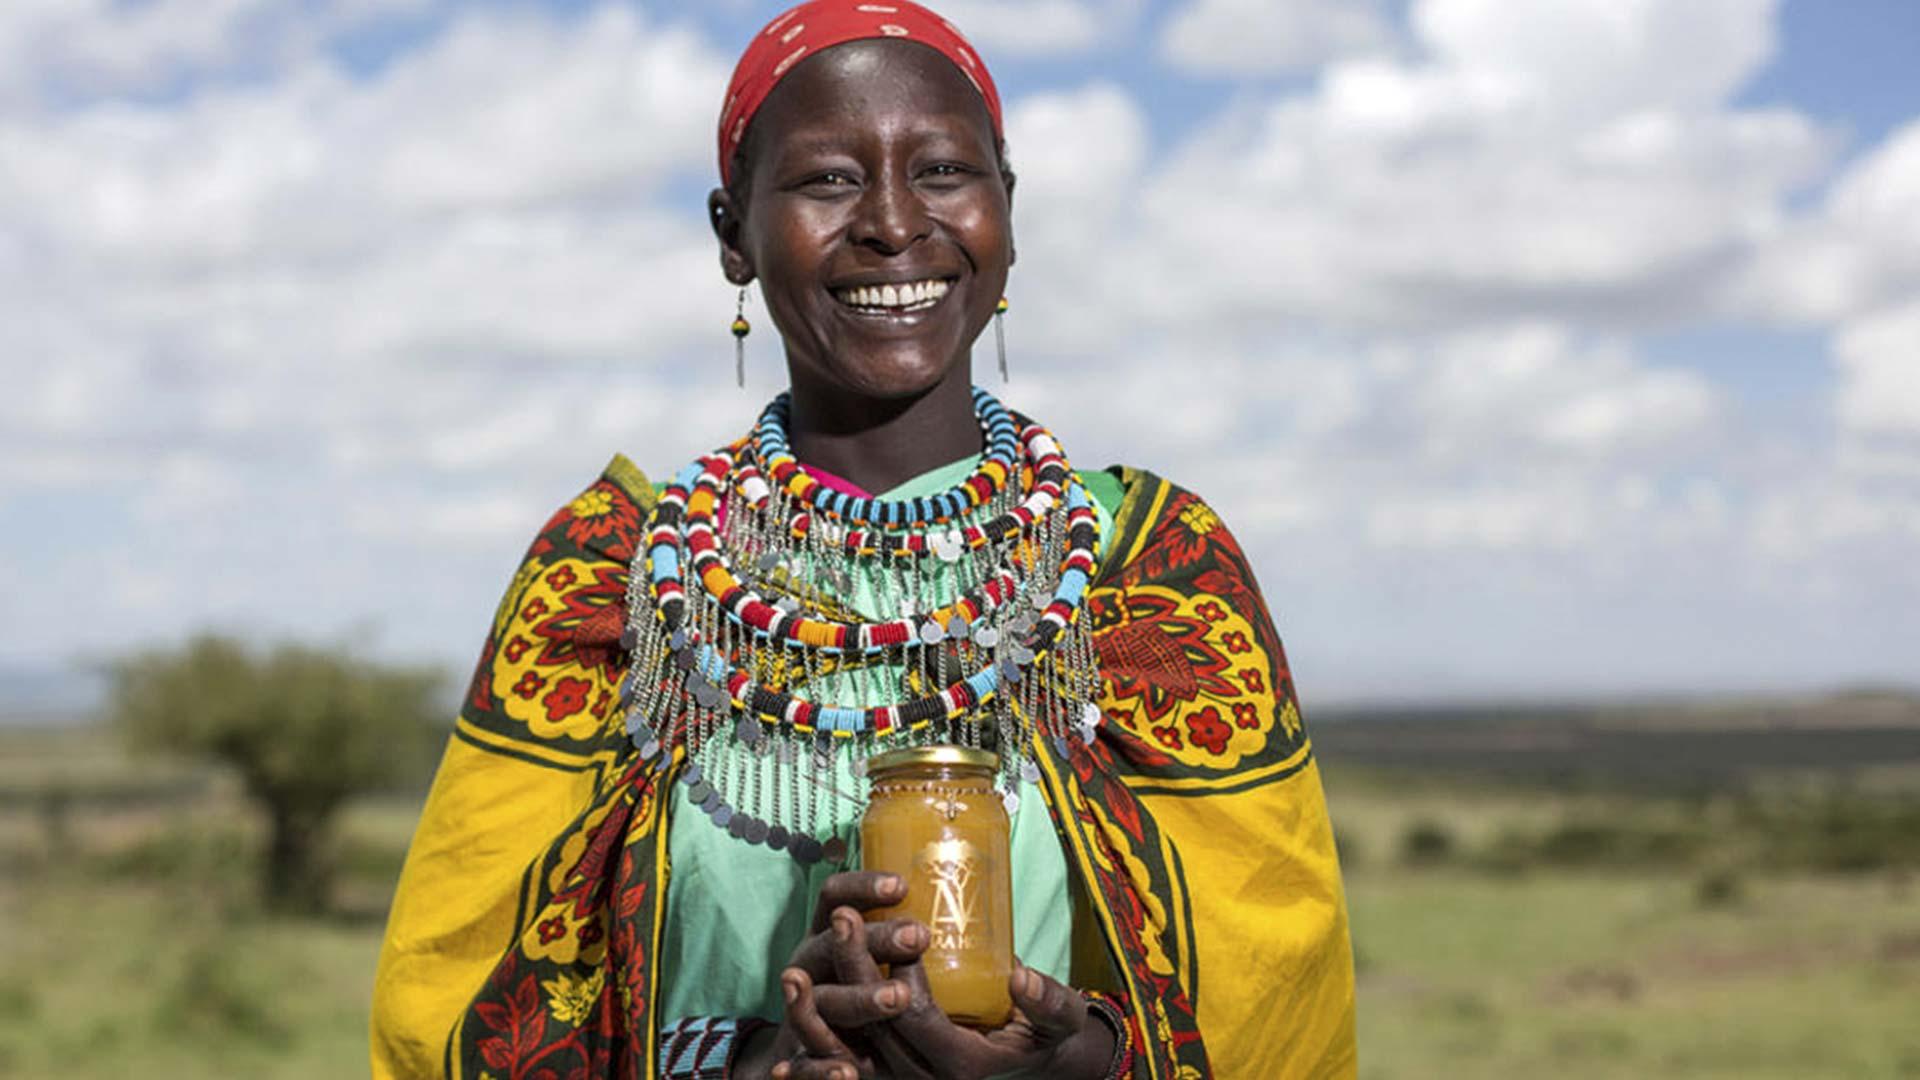 Smiling Masai Woman